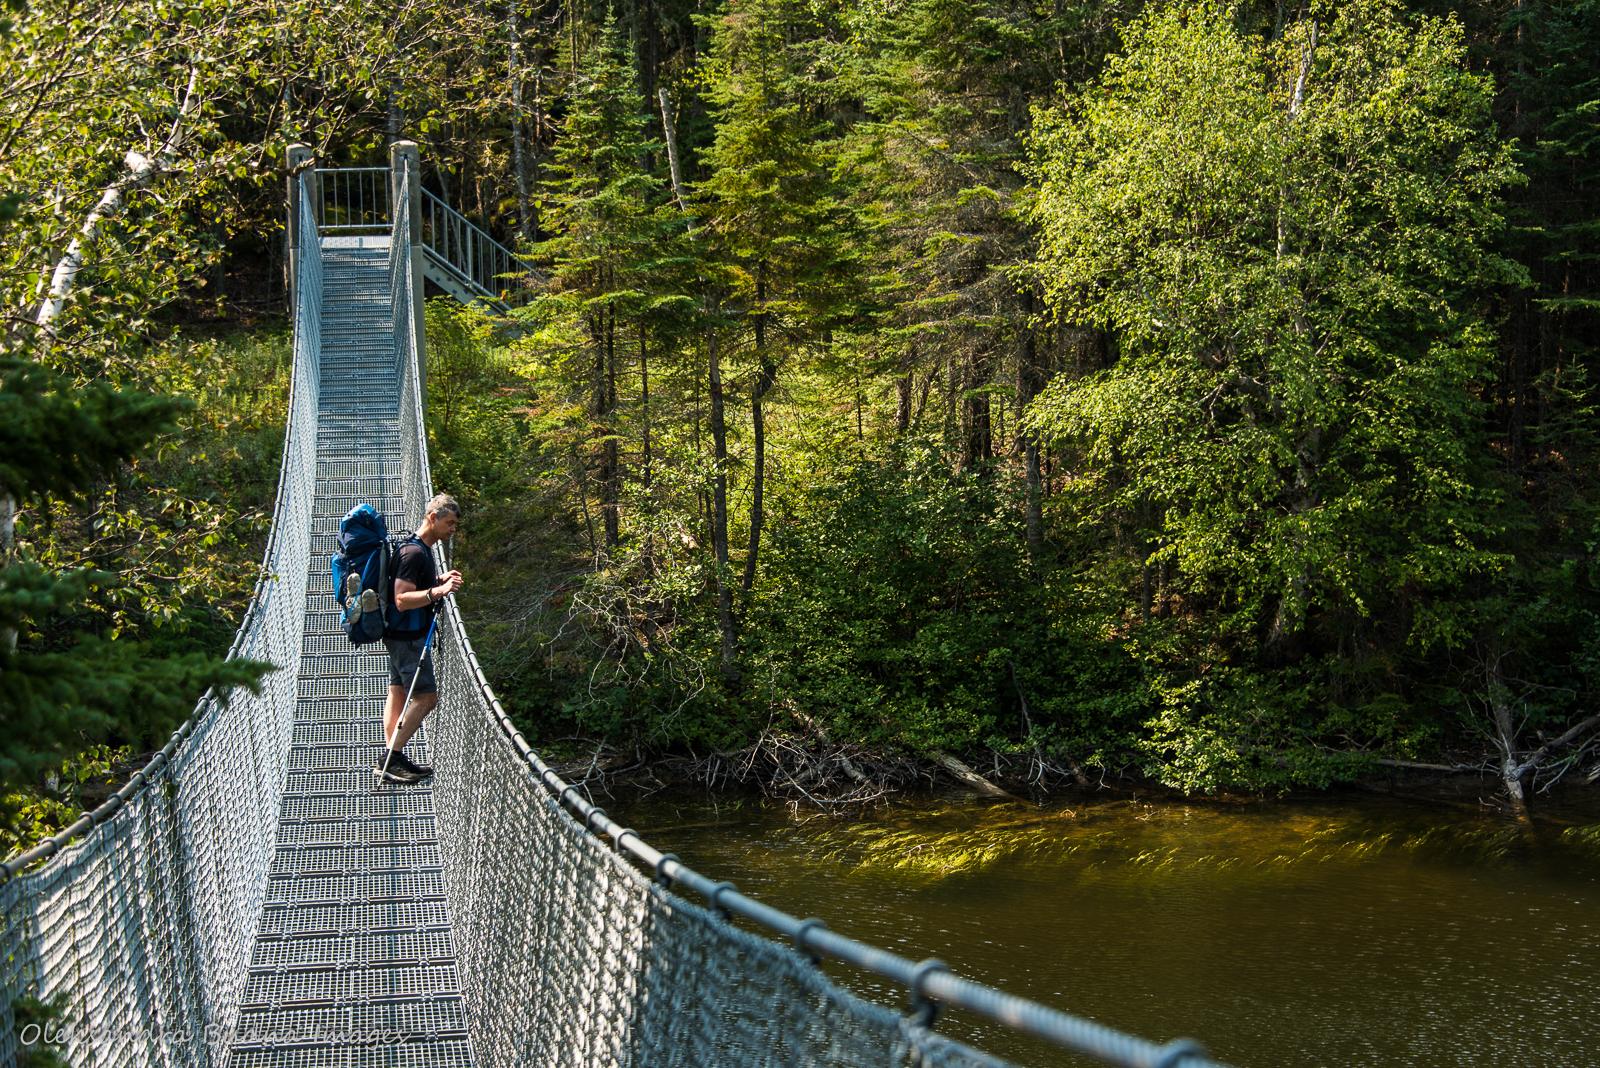 crossing suspension bridge over Willow River in Pukaskwa